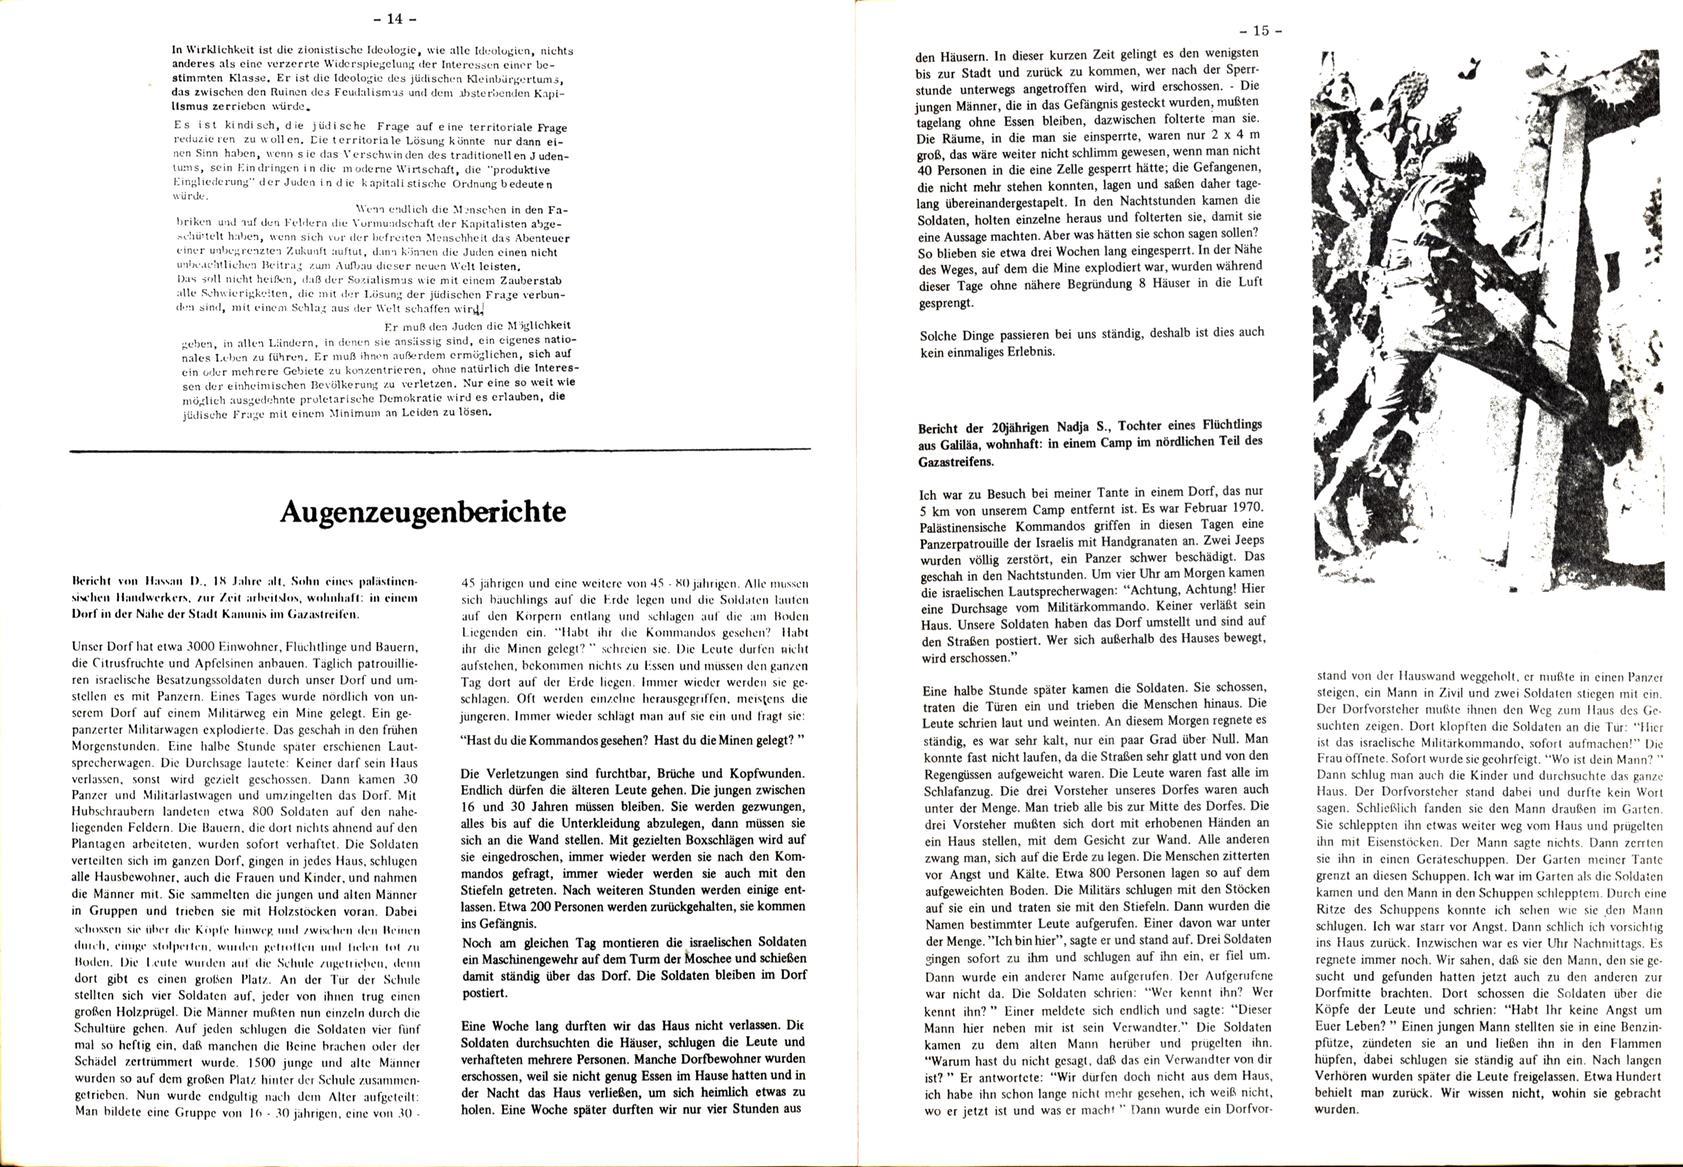 Berlin_AE_1972_Palaestina_08